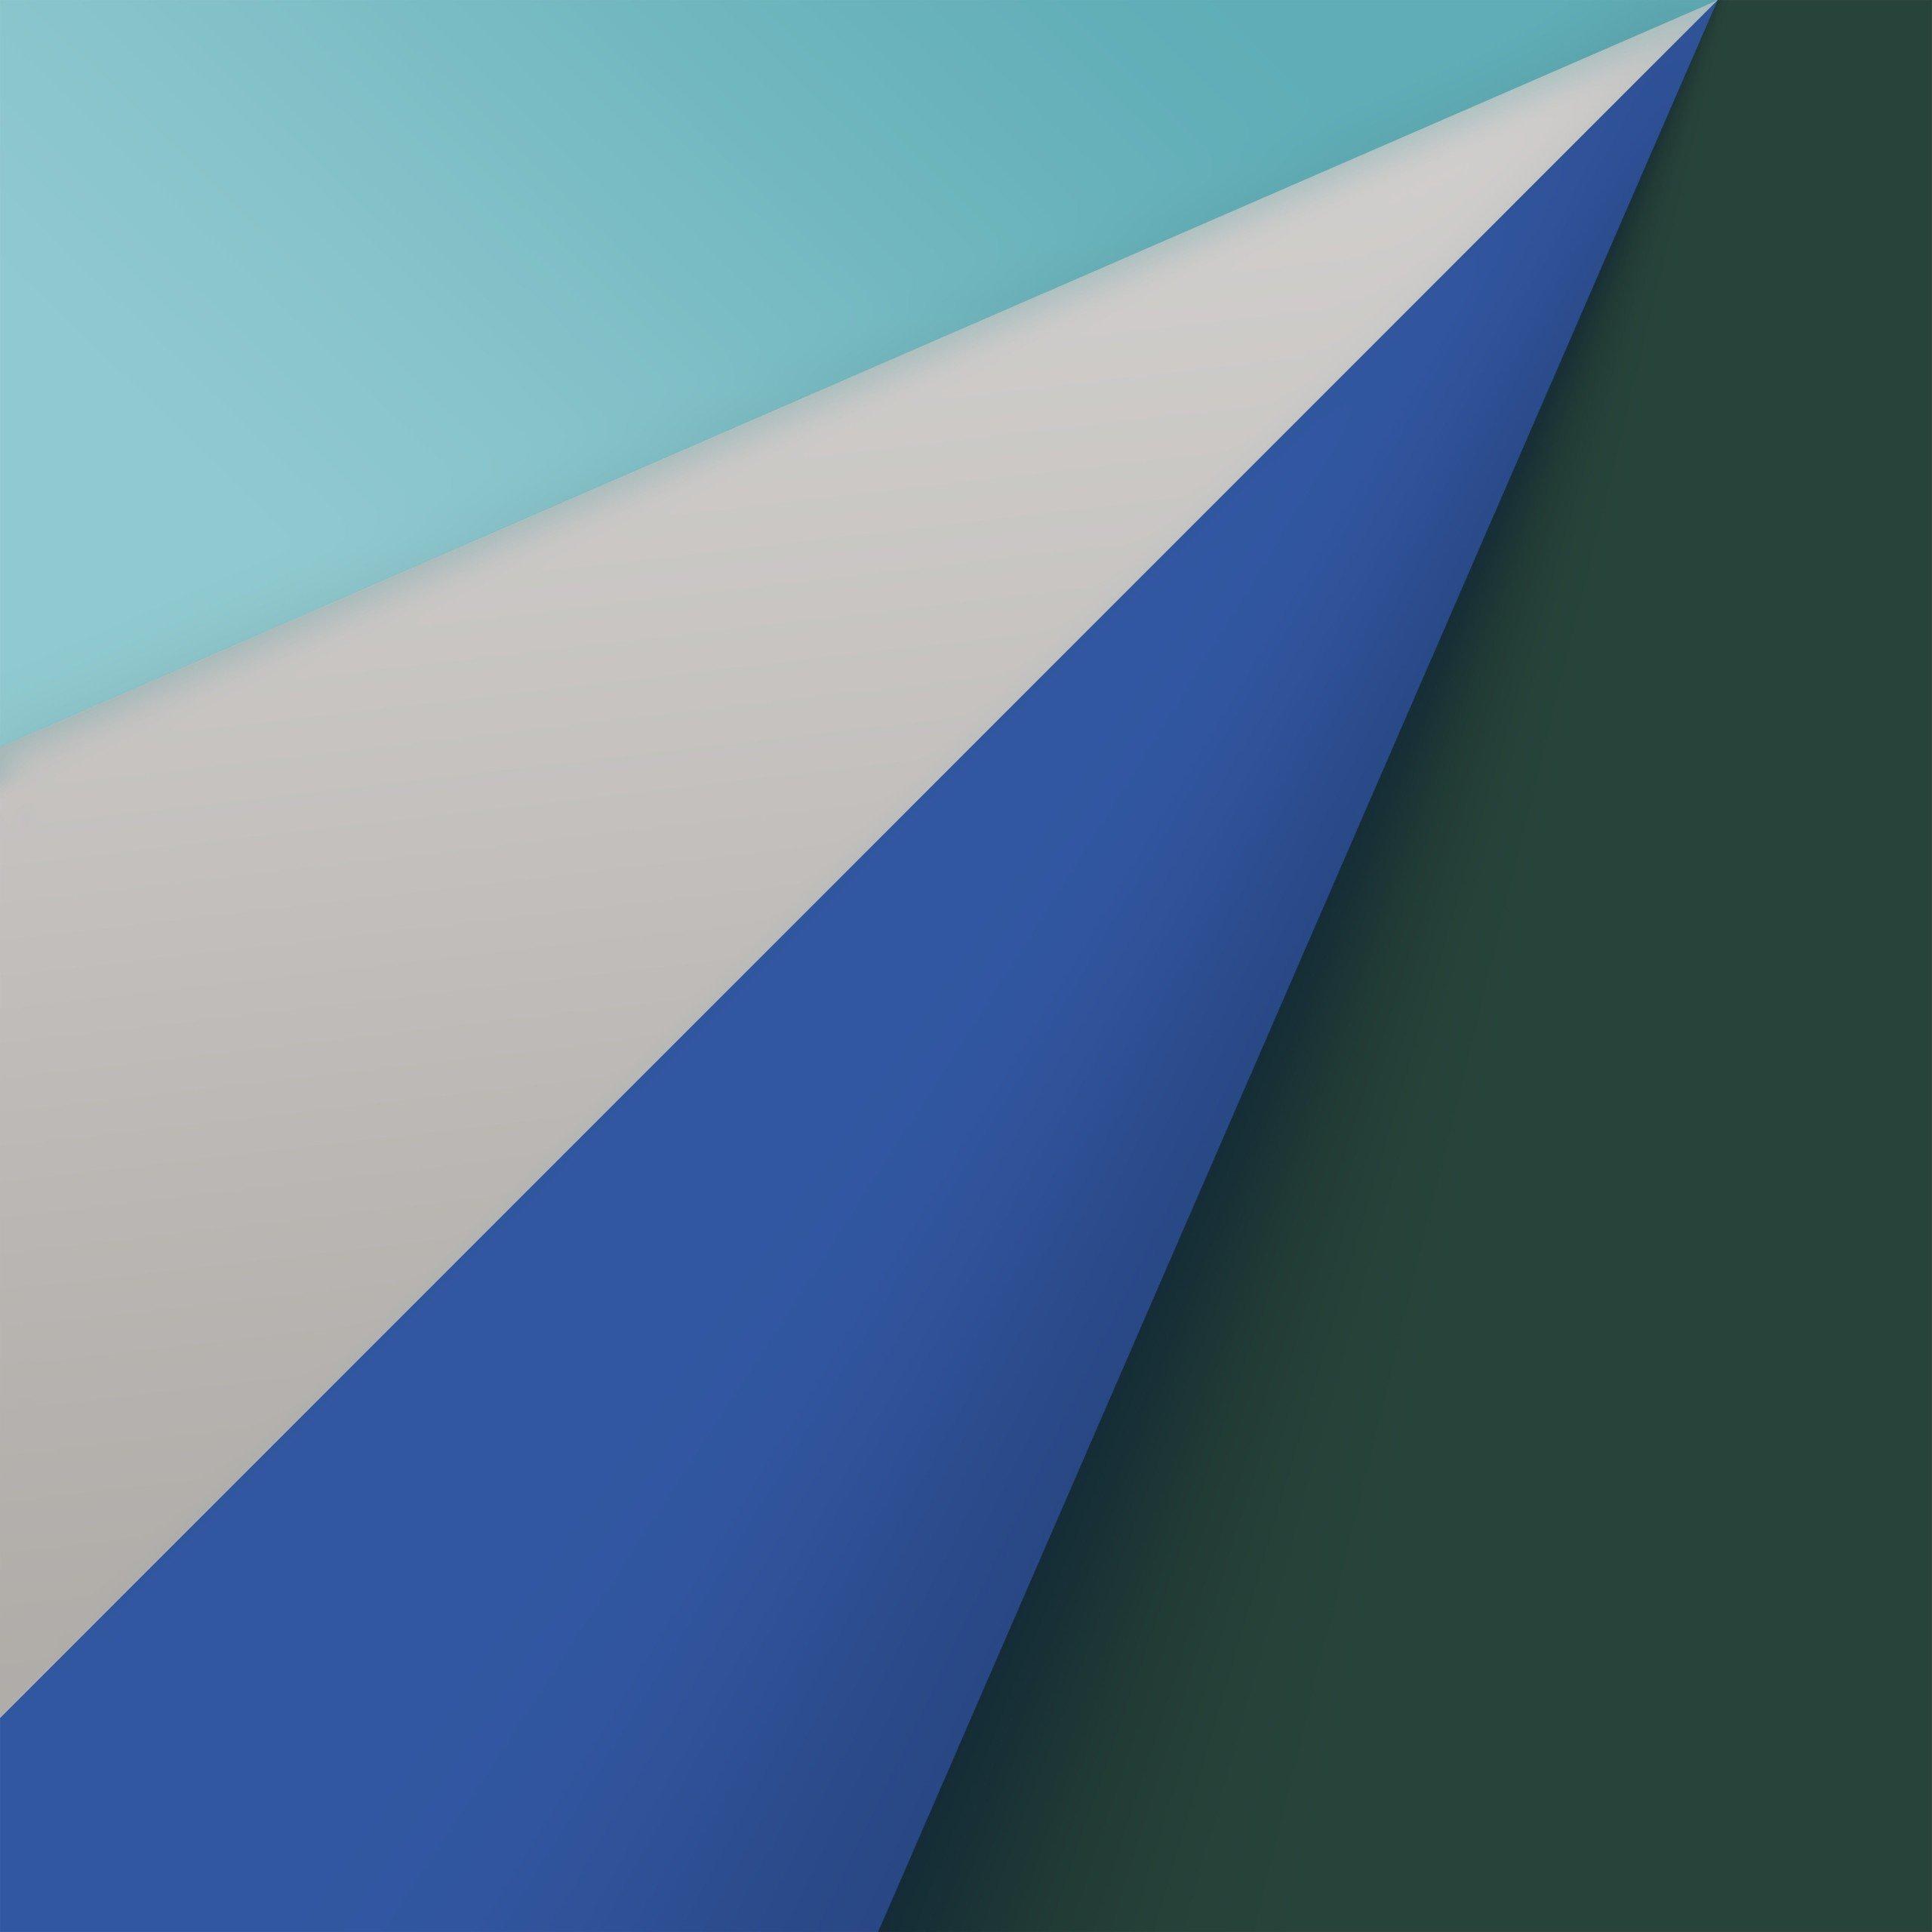 Safari Wallpaper AR72014 iPad Desktop Blue